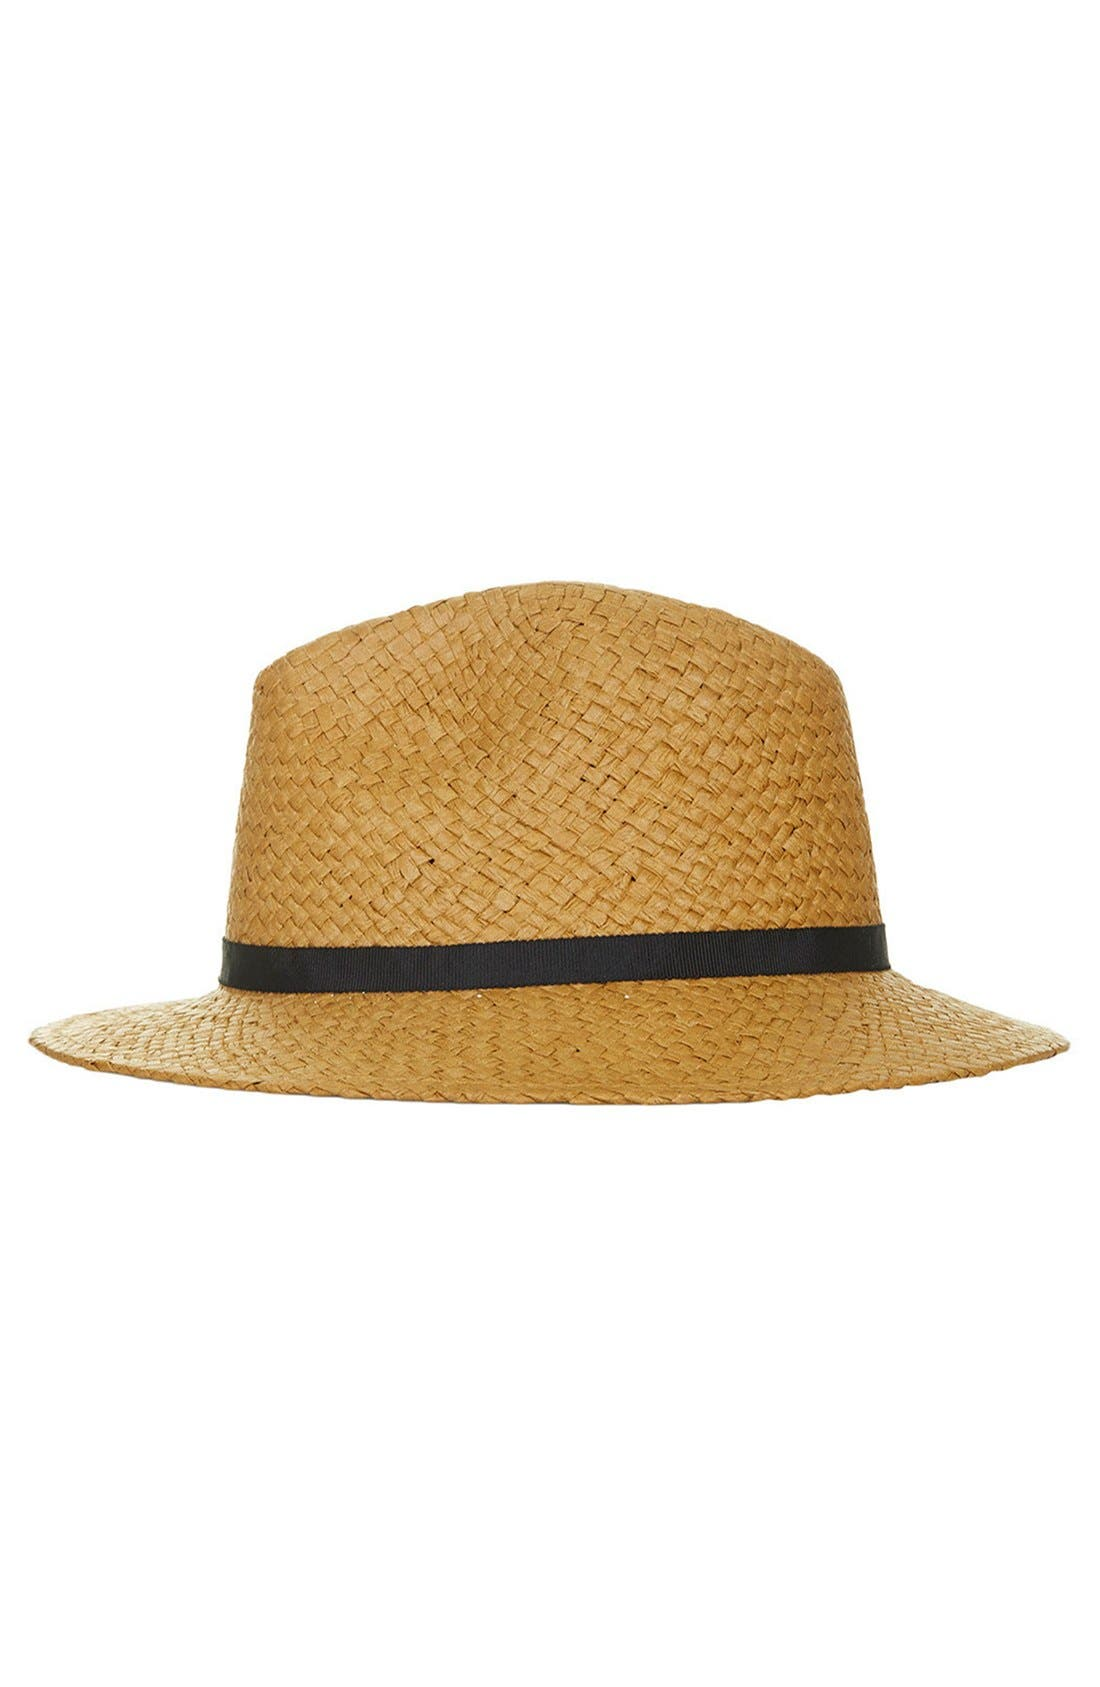 Alternate Image 1 Selected - Topshop Floppy Straw Hat